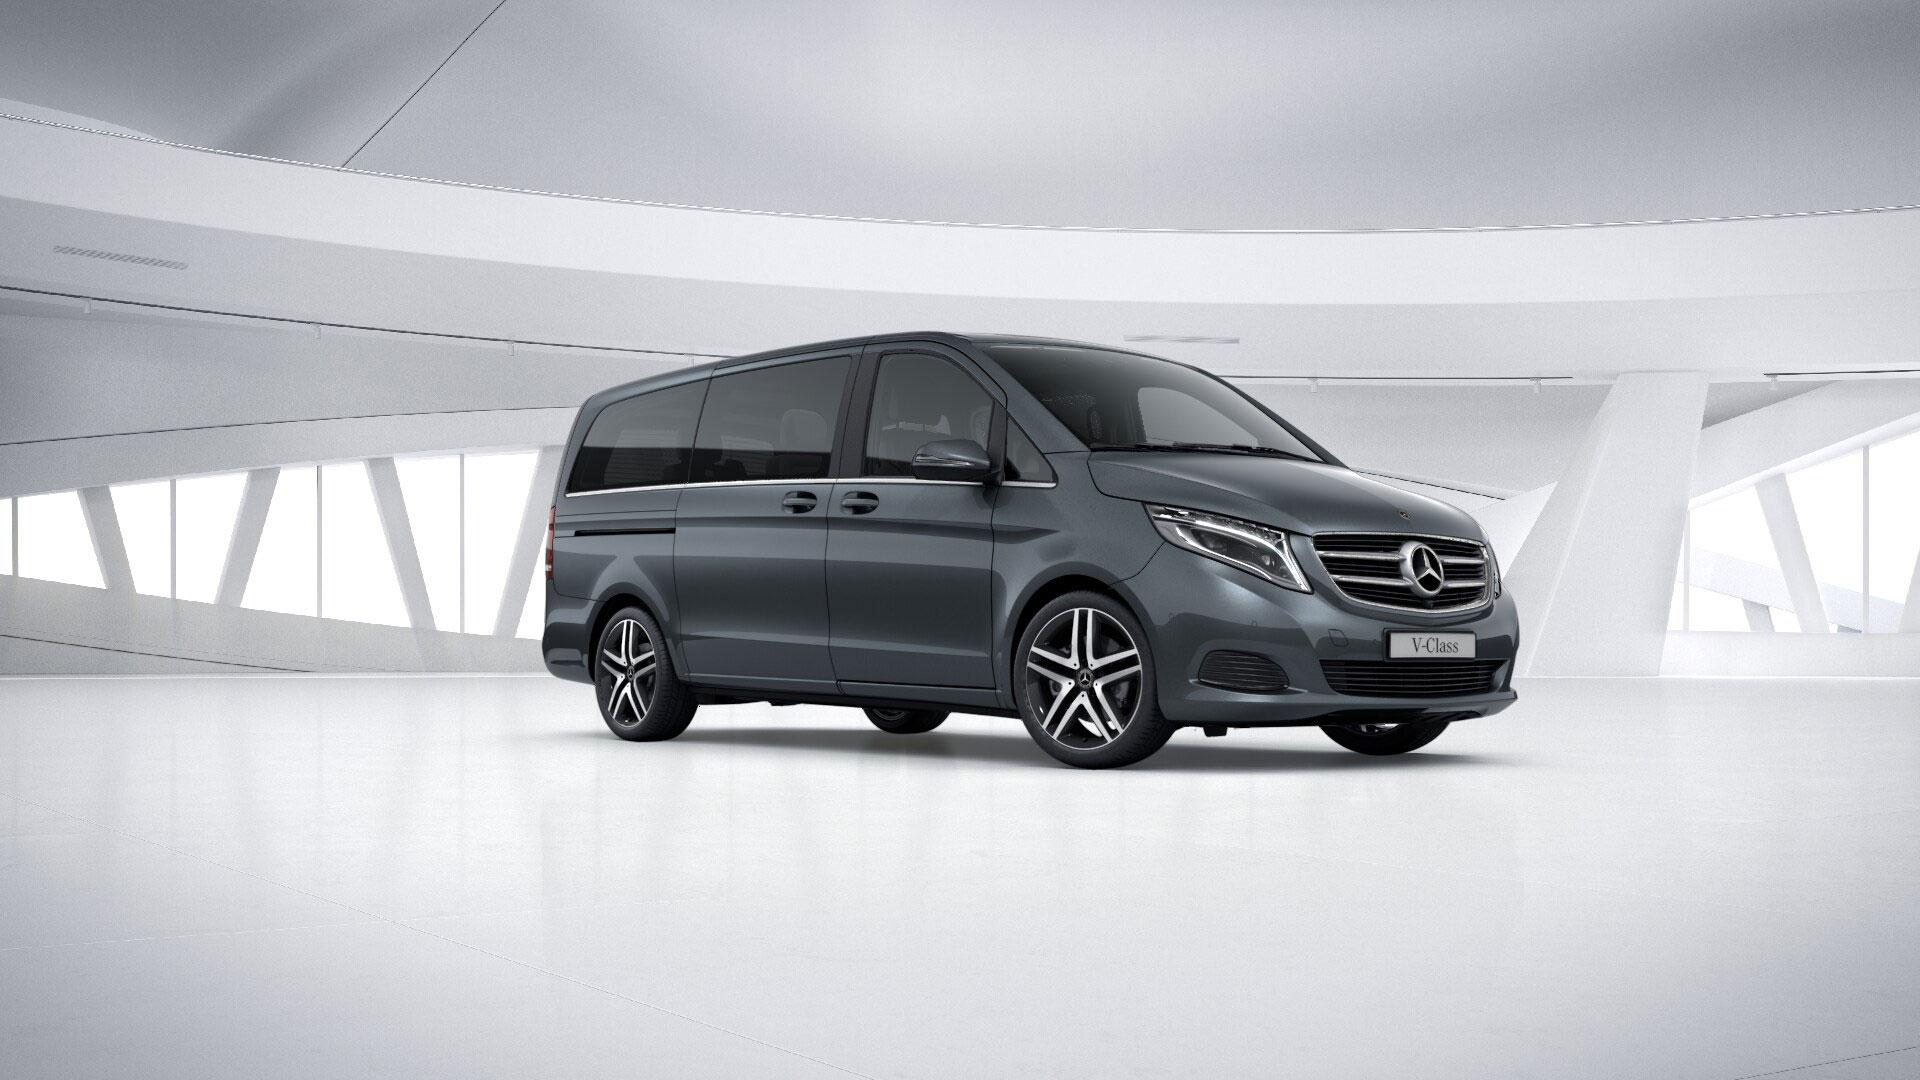 Mercedes-Benz V-Class 5852600130